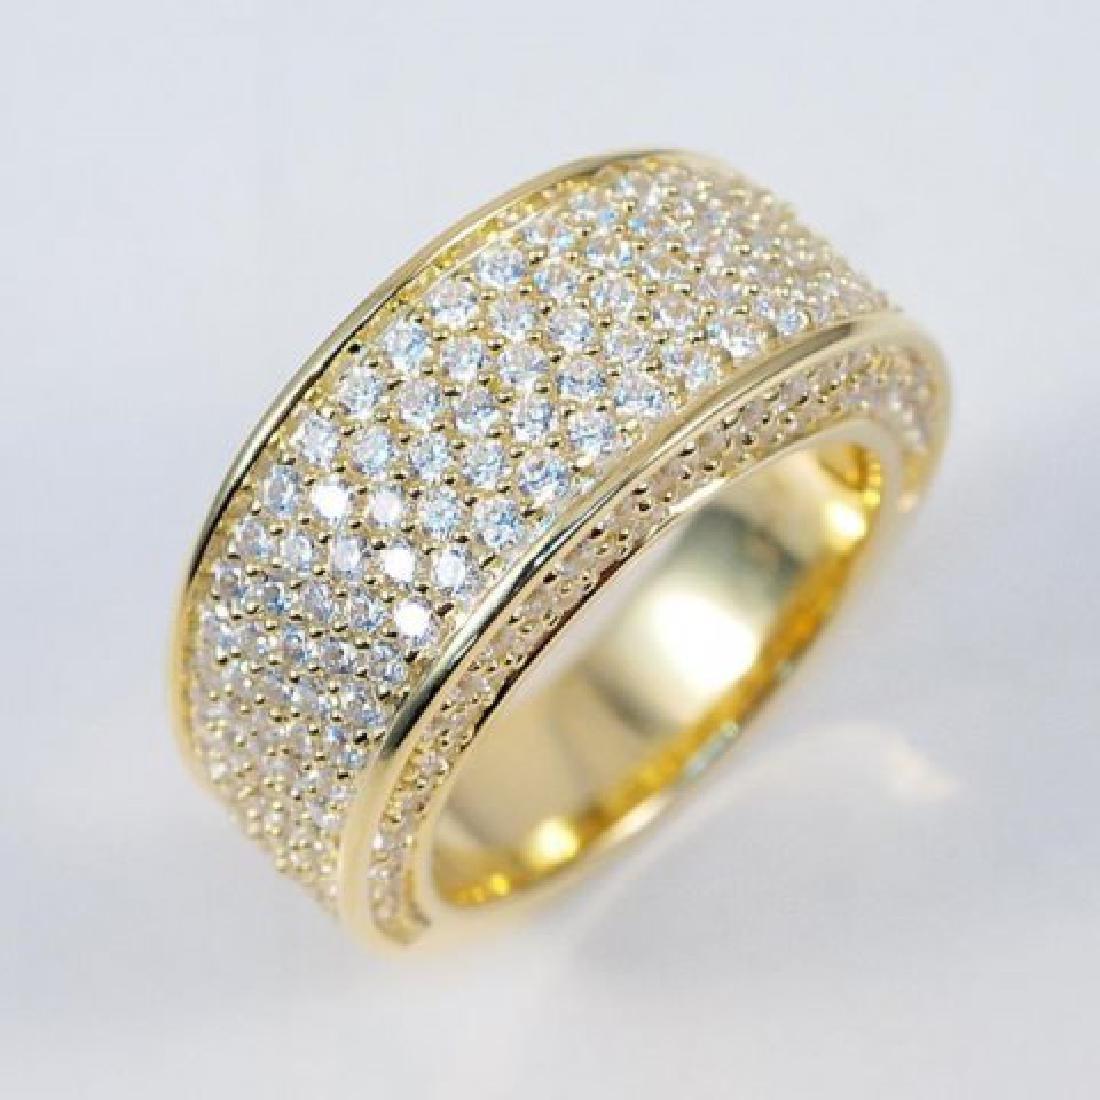 Creation Diamonds Ring 2.00 Carat 18k Y/G Overlay